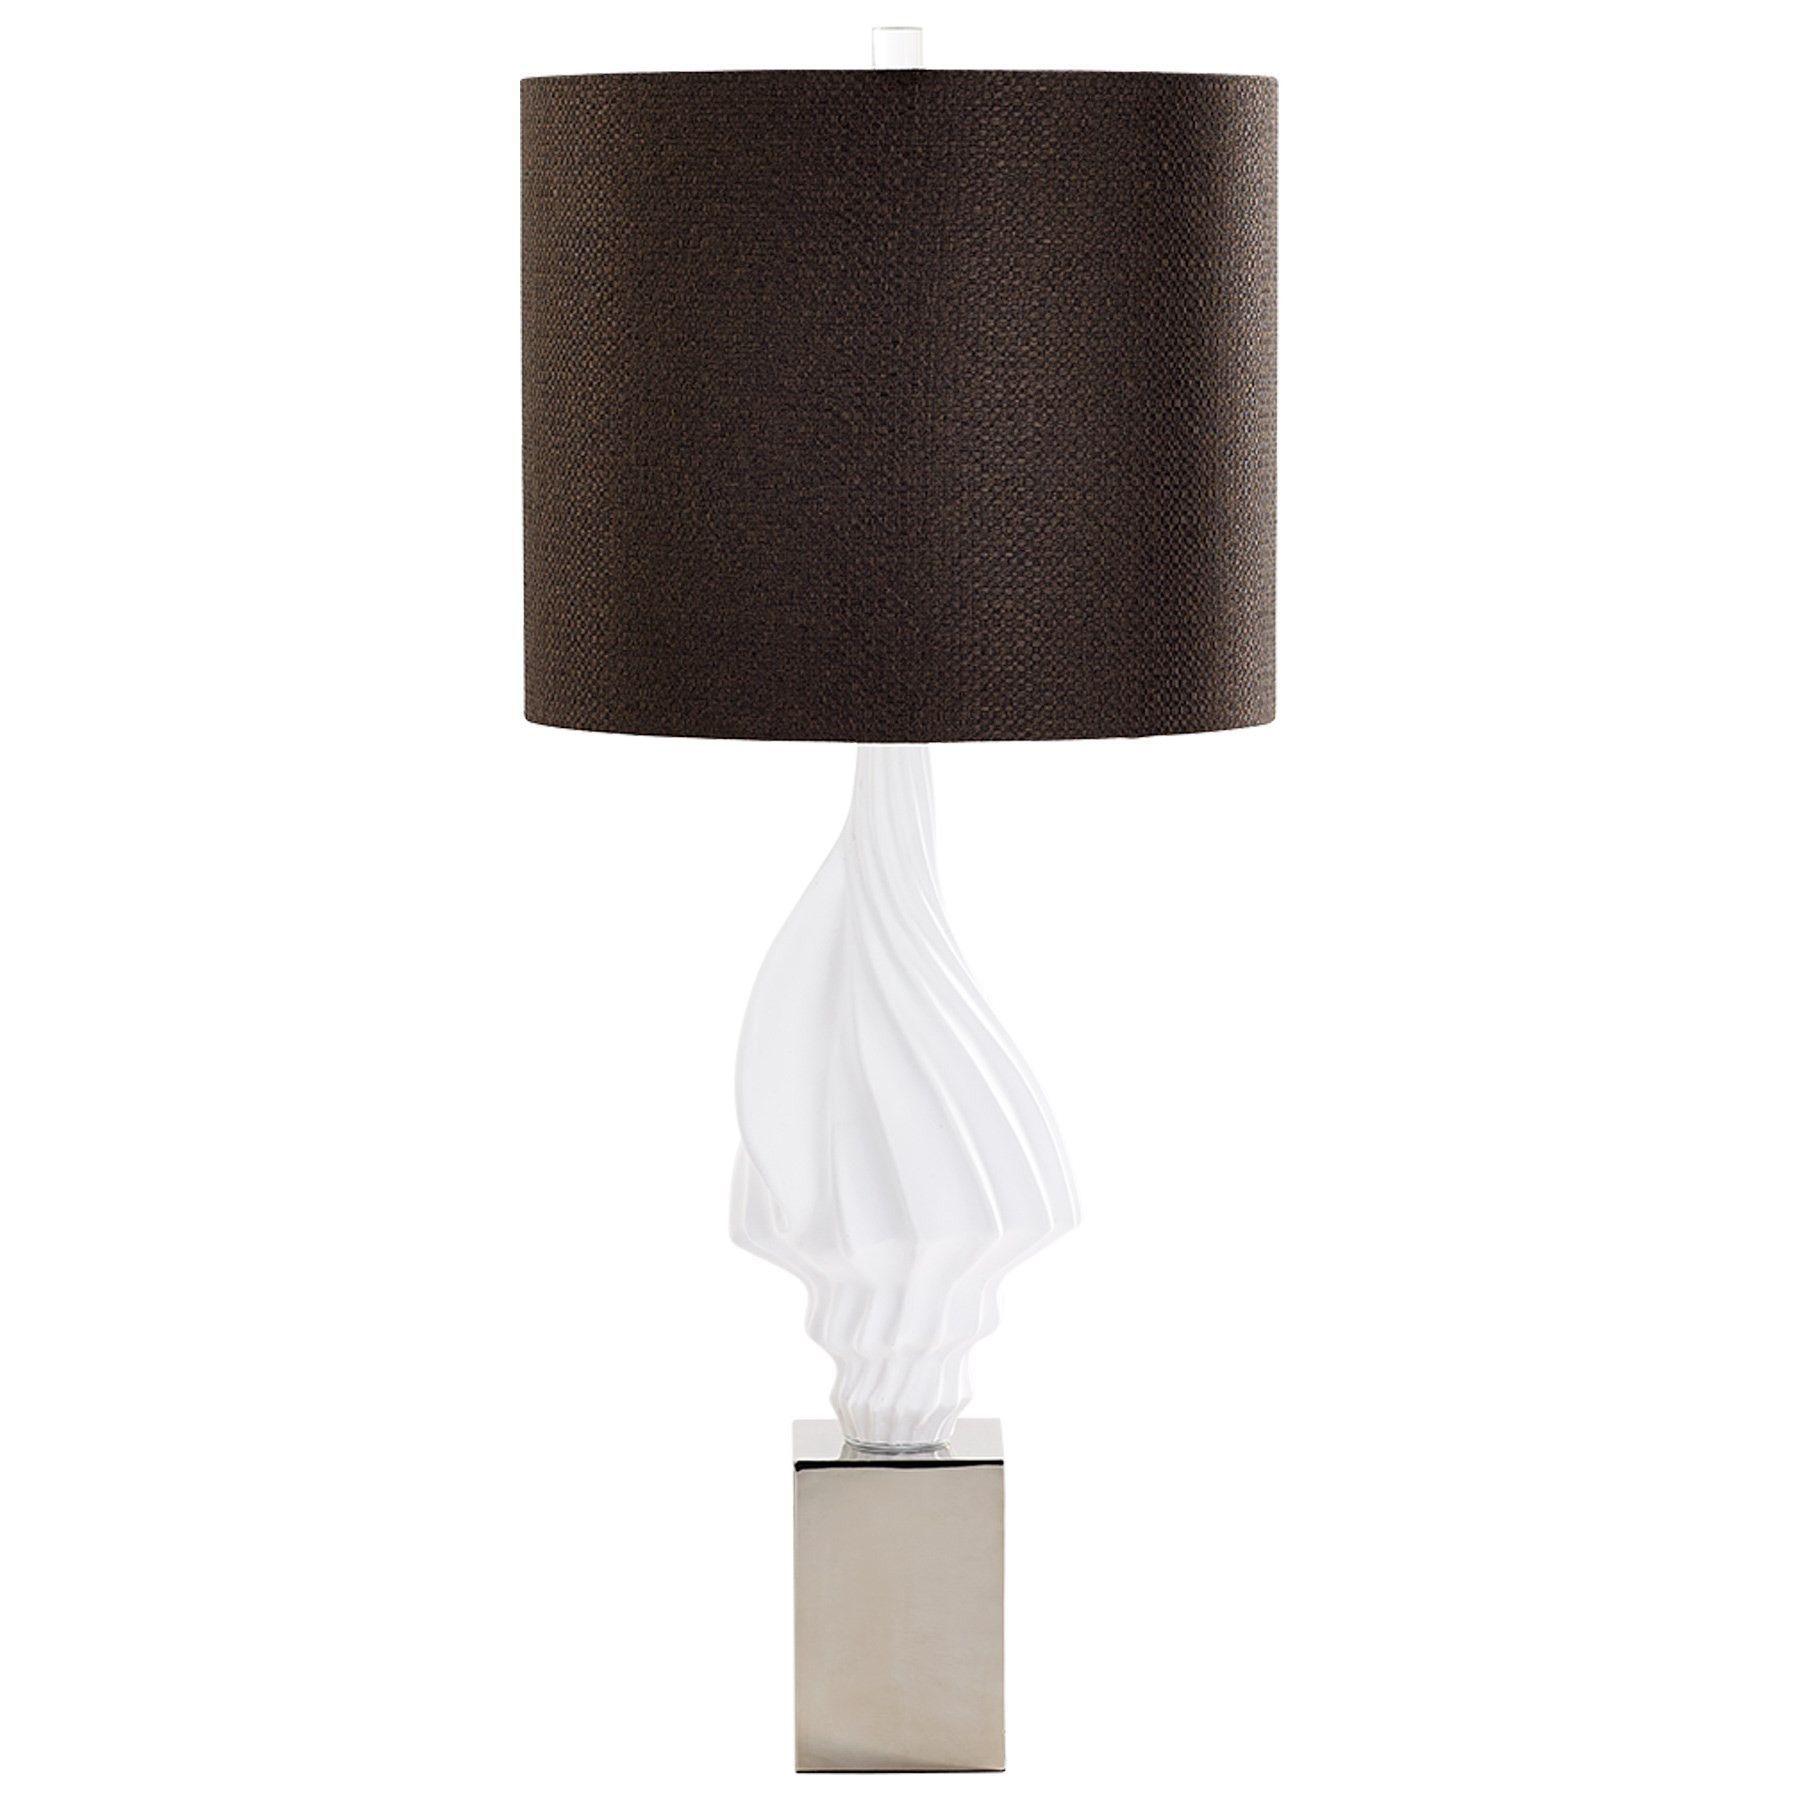 Vestfold Table Lamp